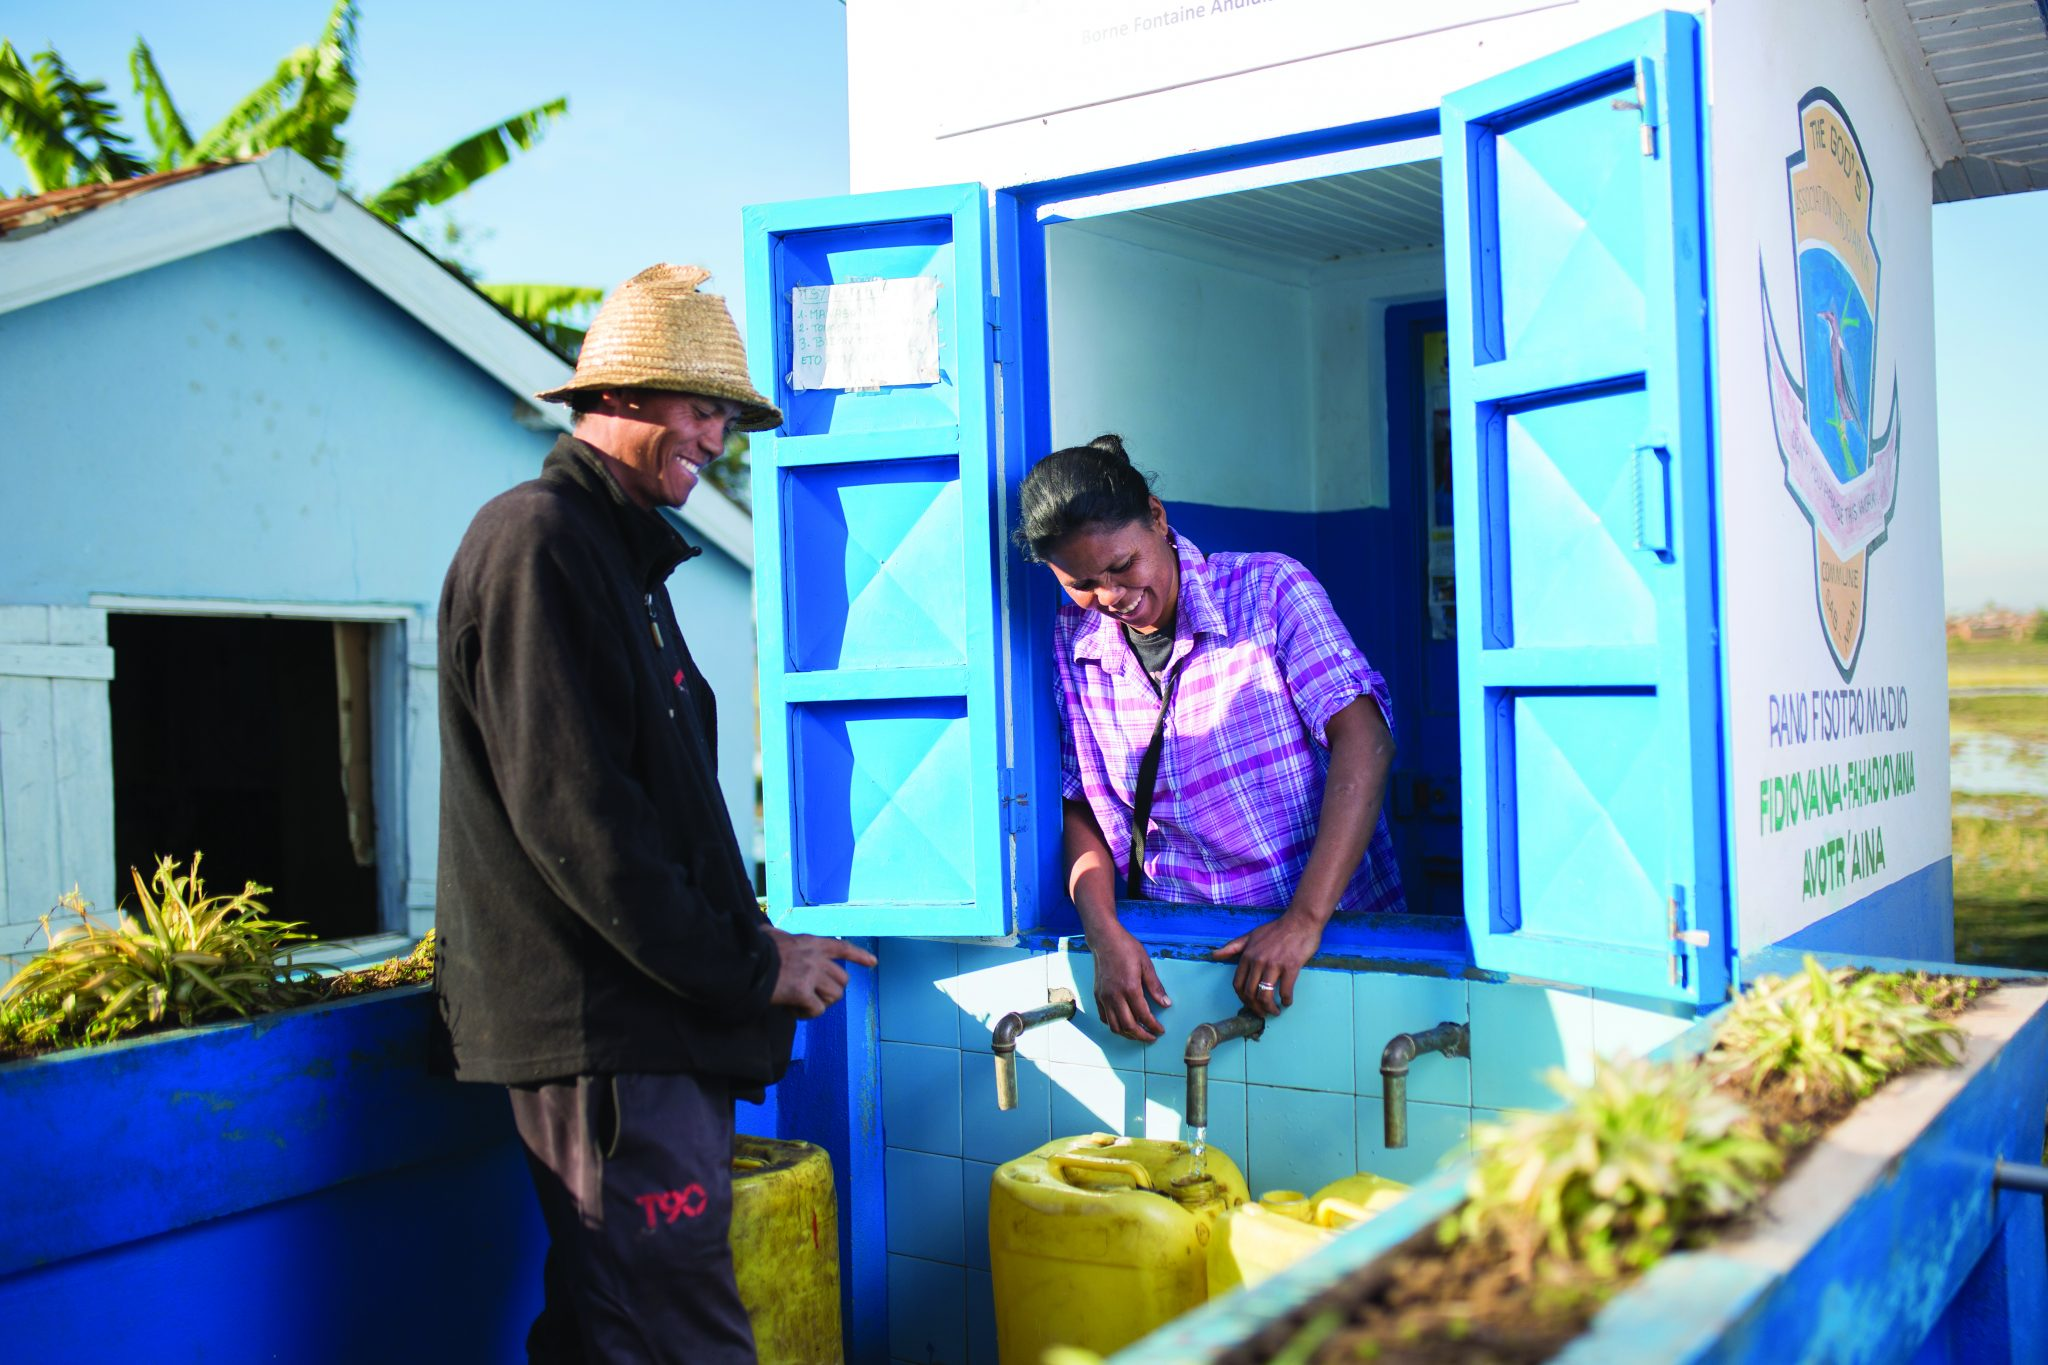 Kiosk operator serves a customer in Madagascar